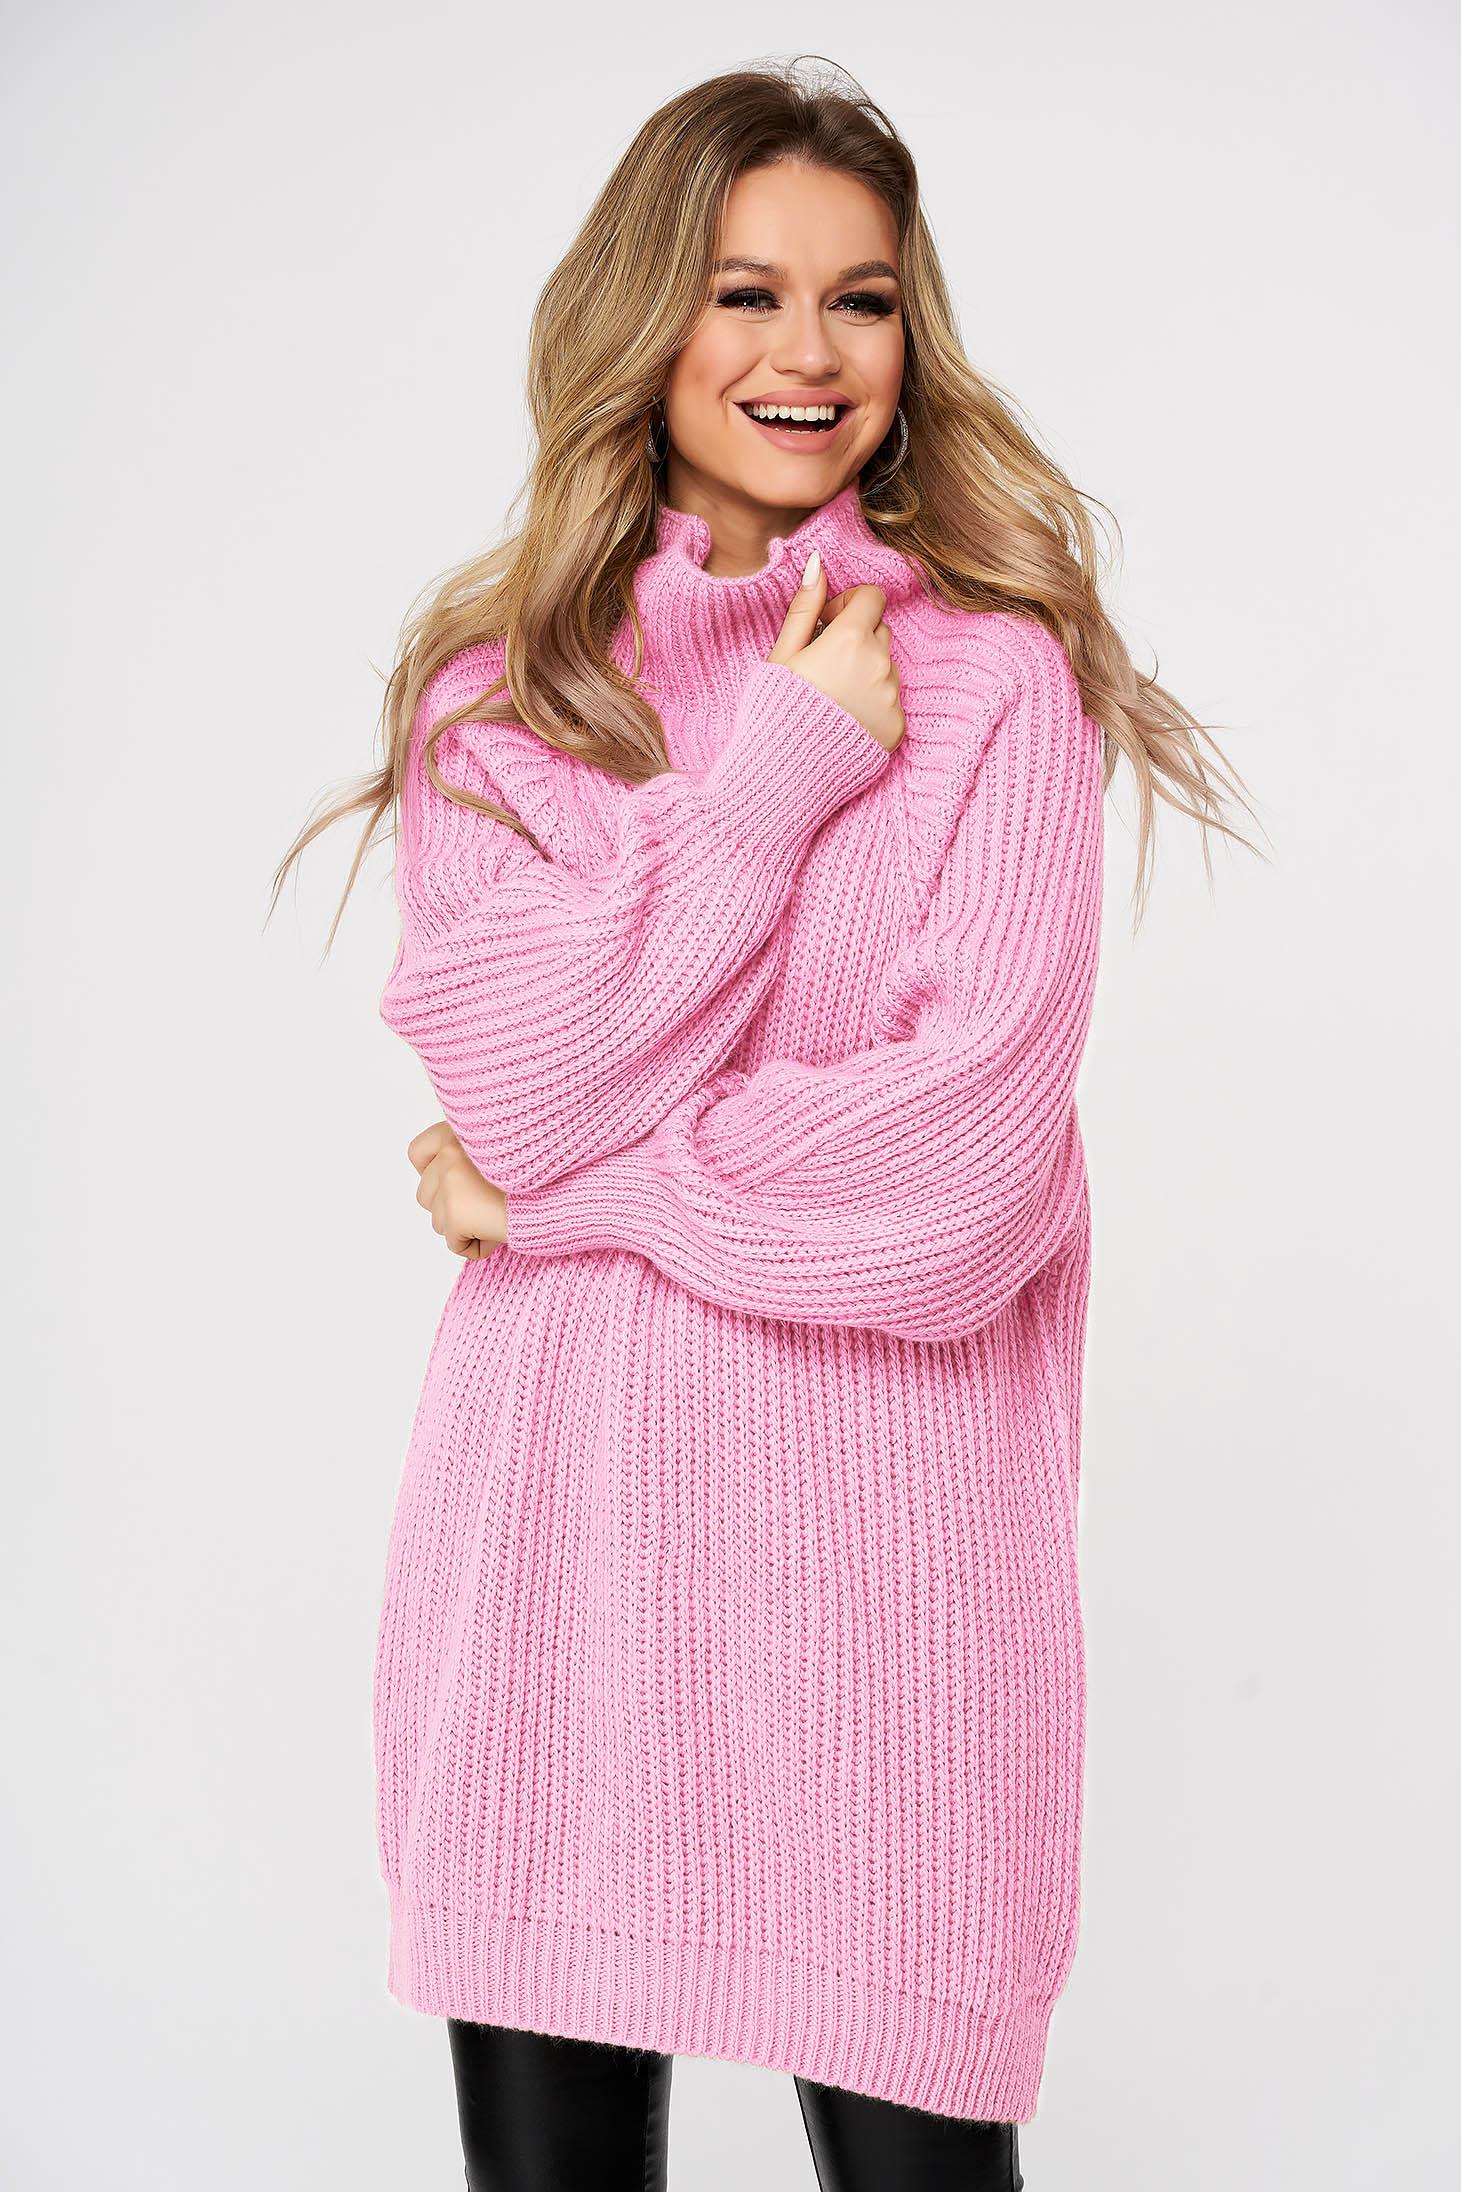 Pulover SunShine roz-deschis casual din material tricotat gros pe gat cu croi larg